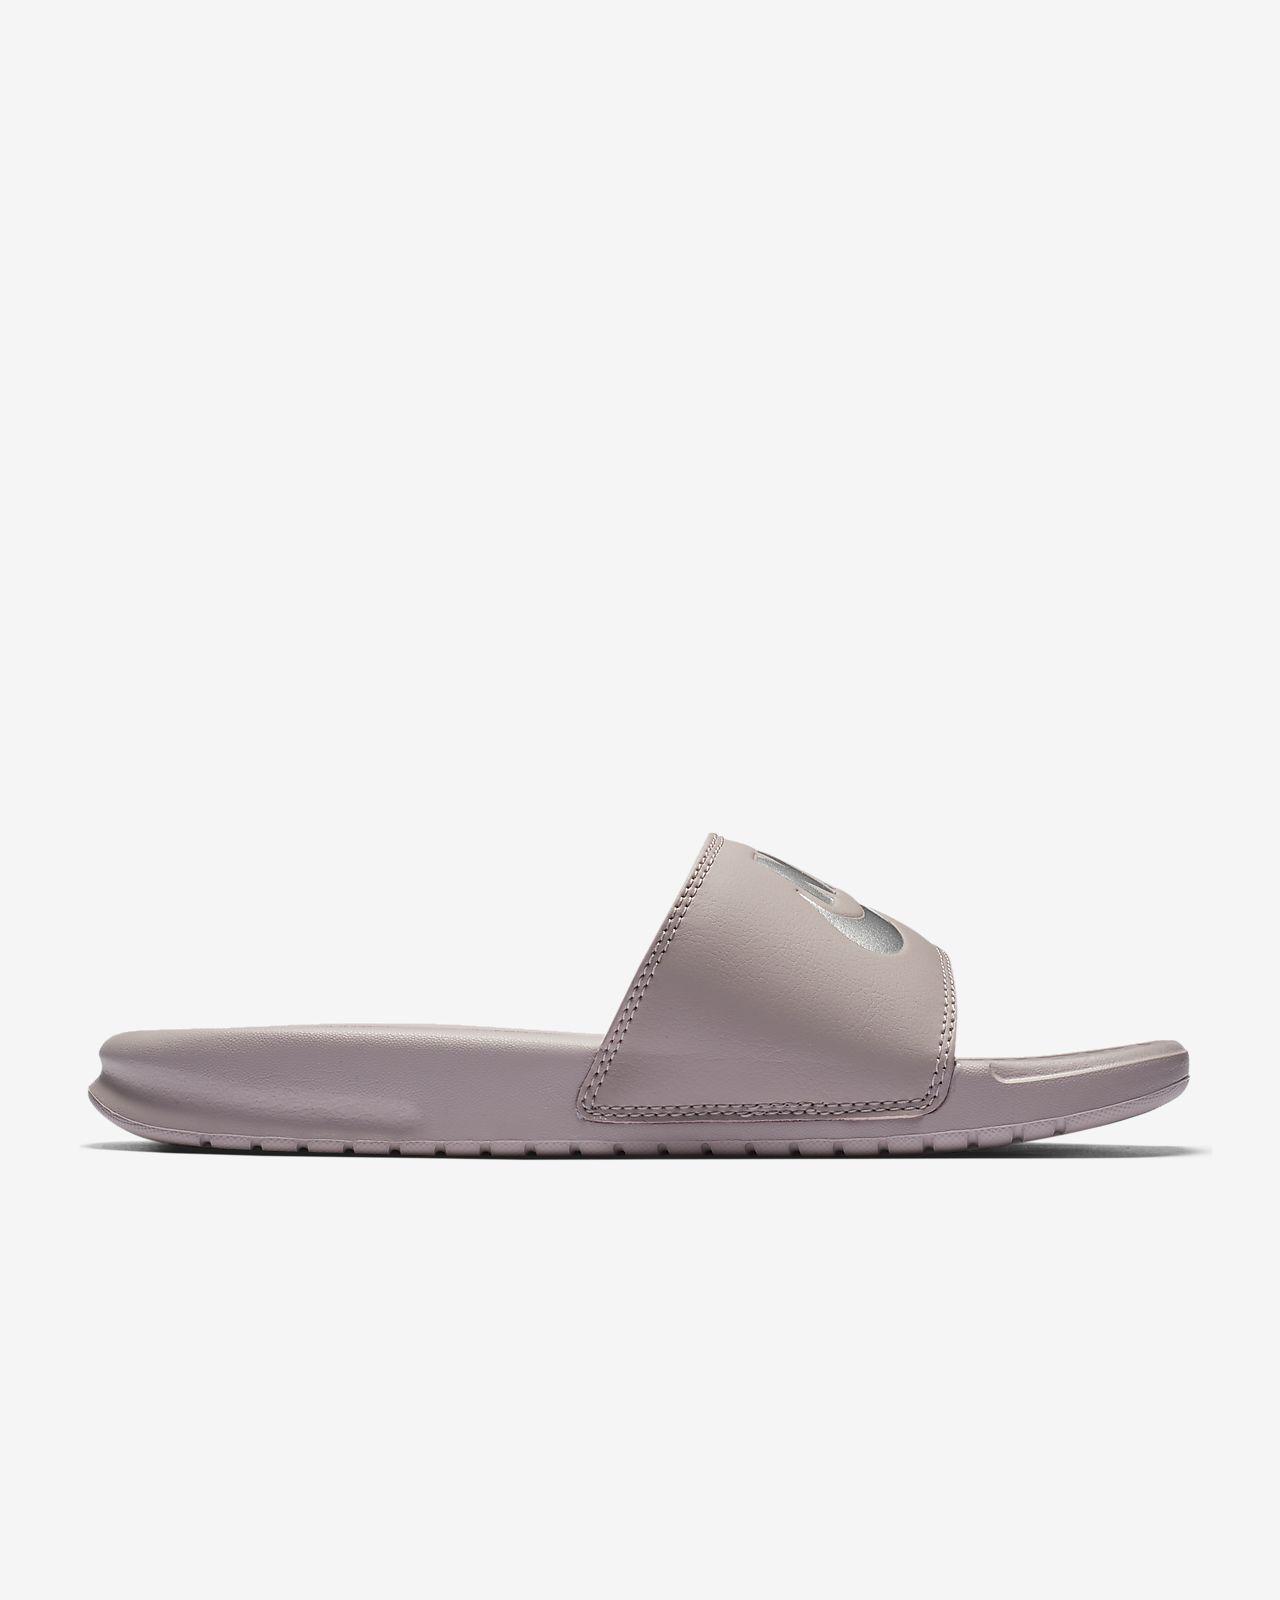 8db95da866 Low Resolution Dámské pantofle Nike Benassi Dámské pantofle Nike Benassi